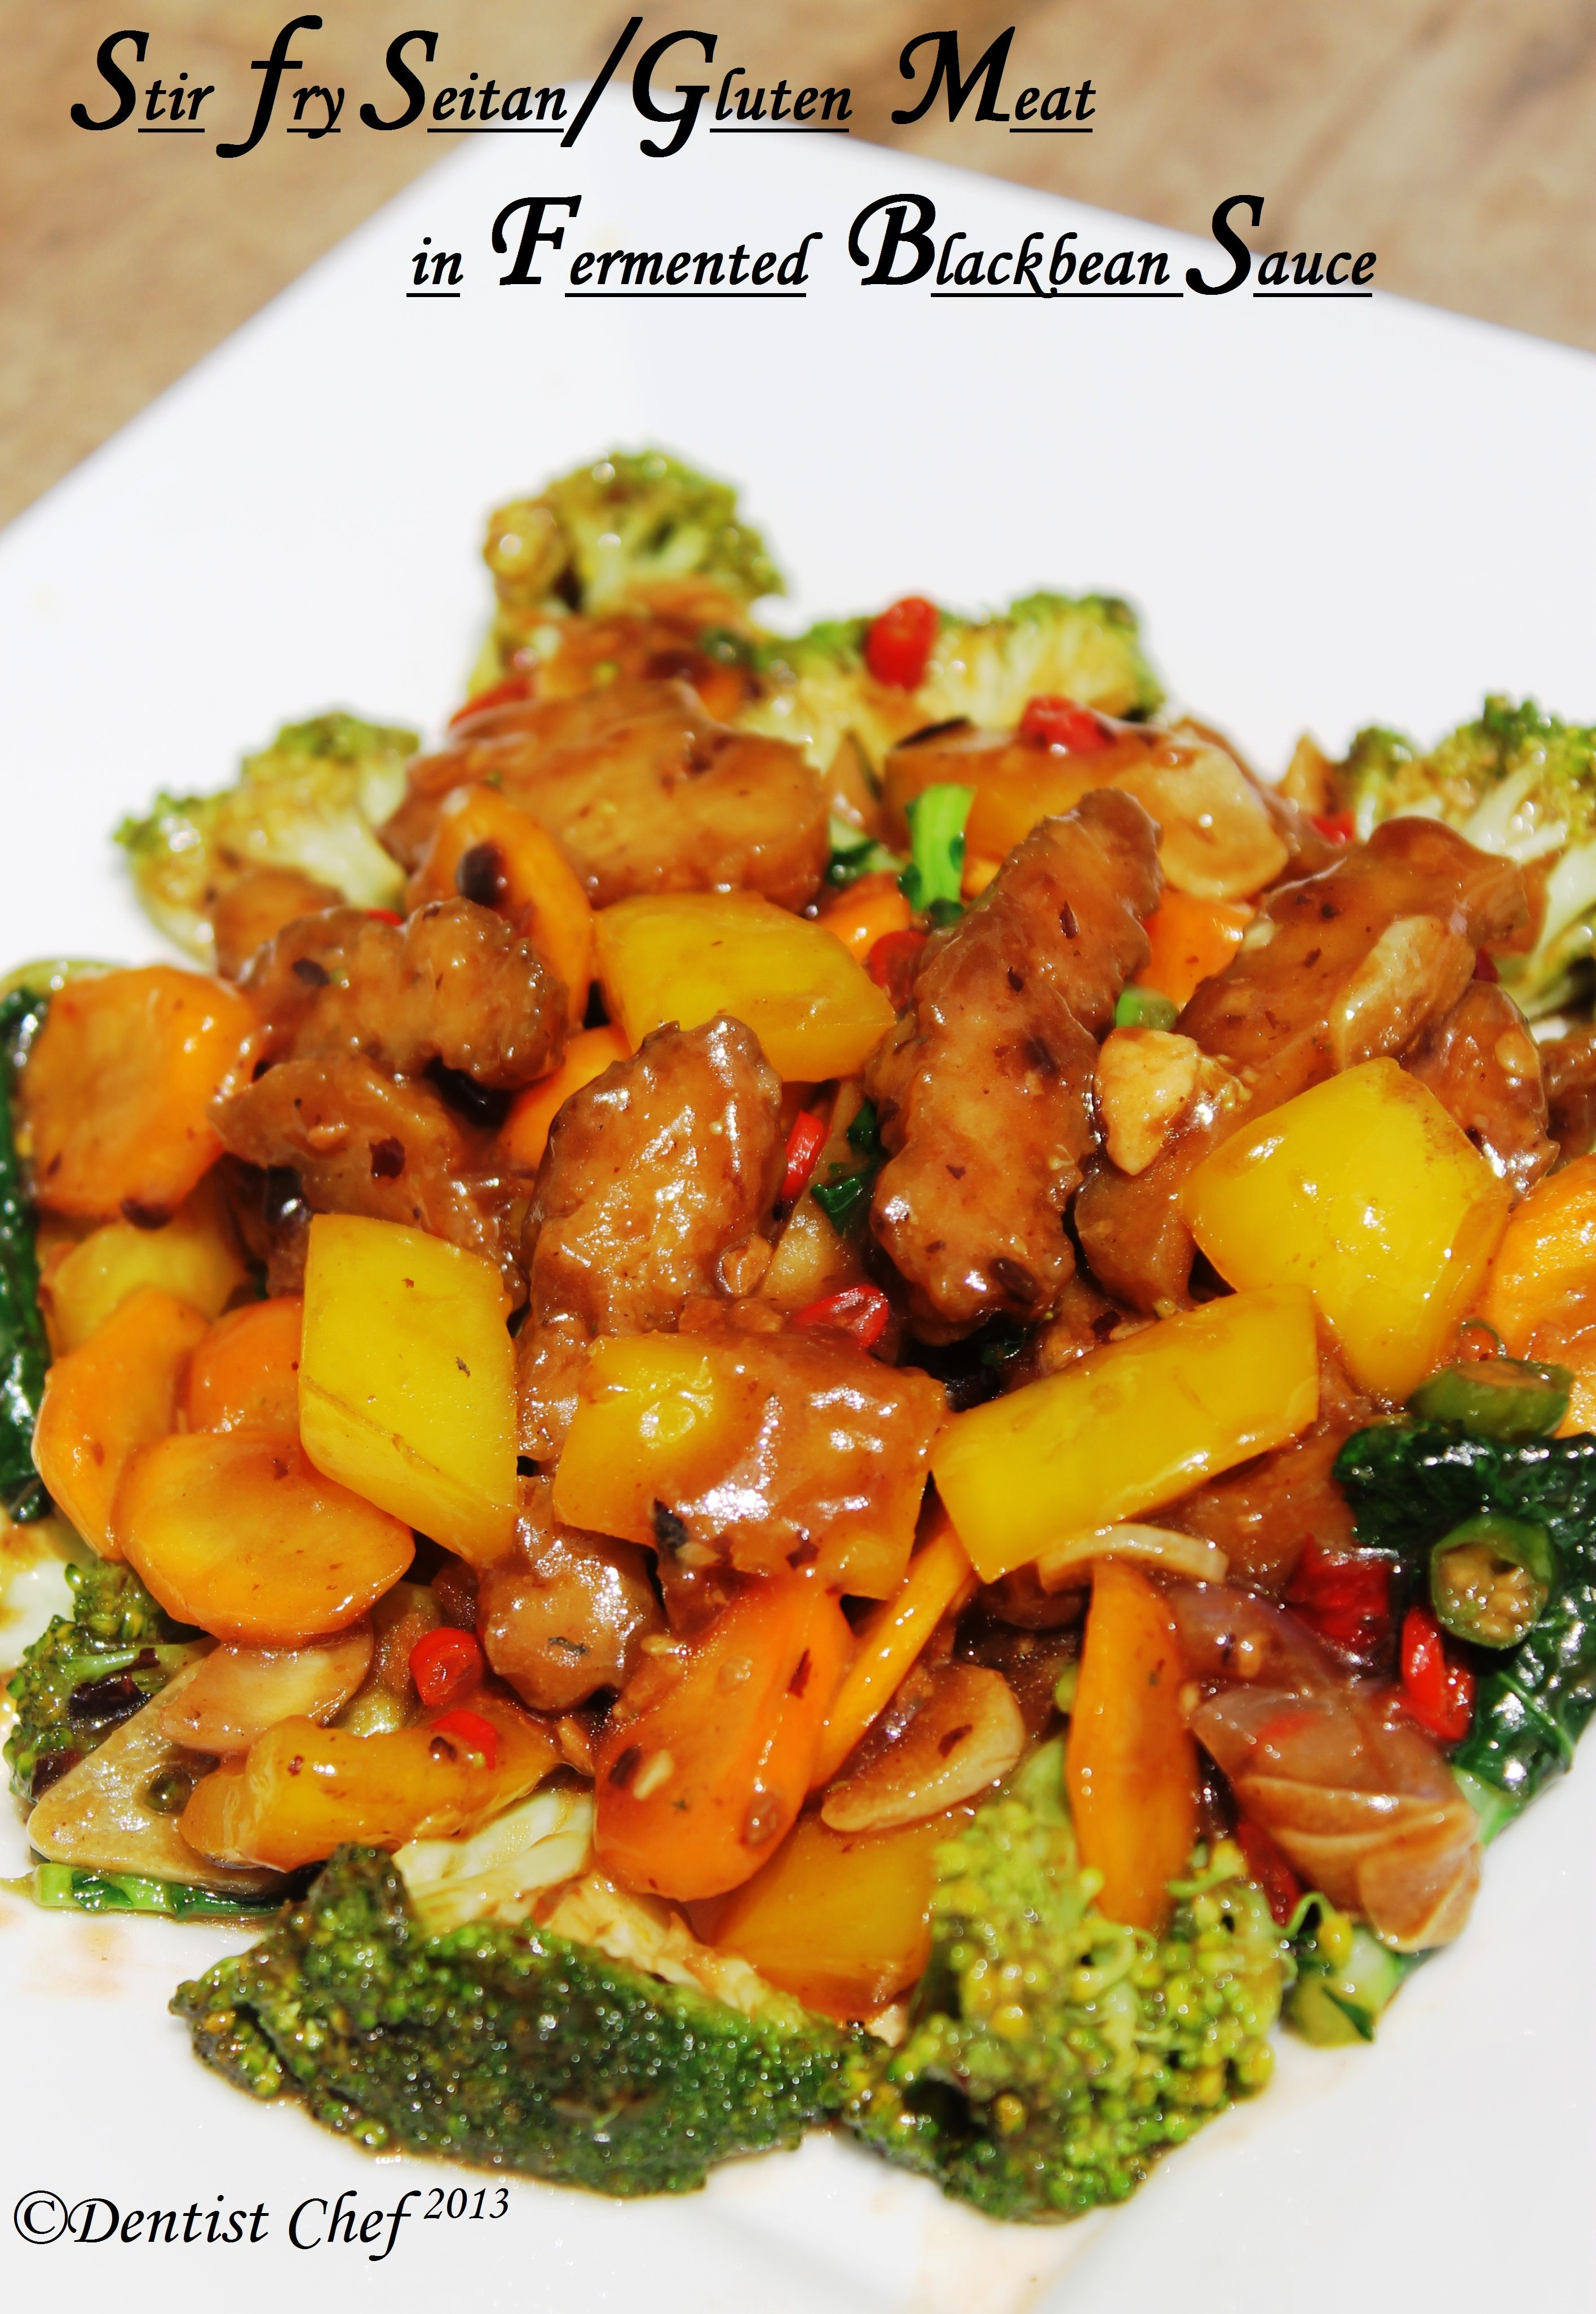 Stir Fry Seitan Gluten Vegetarian Meat In Fermented Black Bean Sauce Meatless Monday Features Resep Masakan Cina Masakan Vegetarian Resep Vegetarian